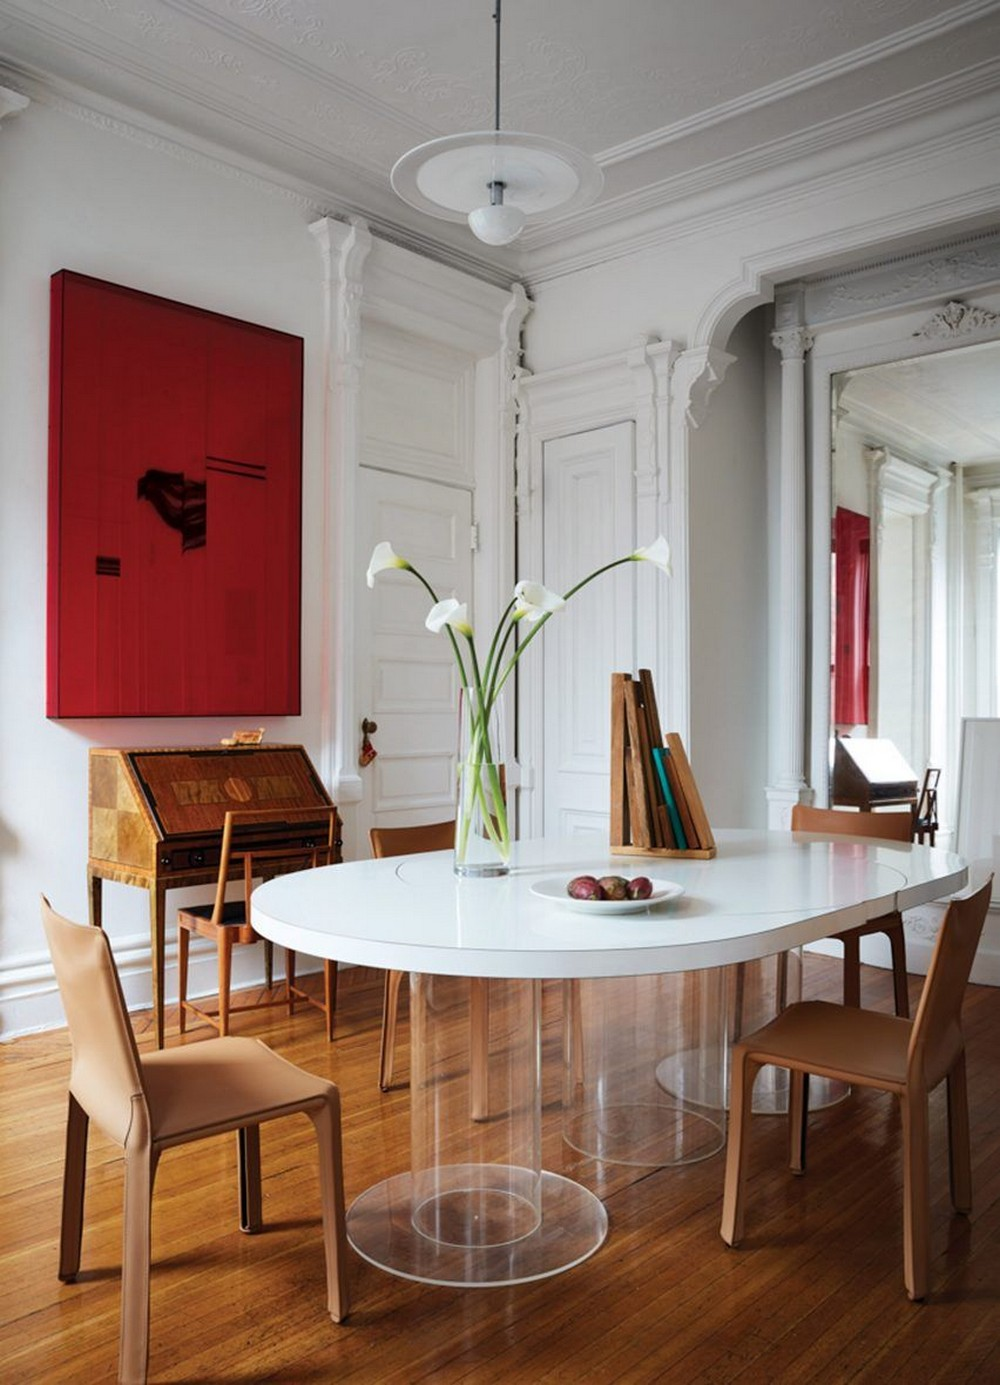 Rafael de Cárdenas: The Perfect Harmony Through Visionary Dining Rooms rafael de cárdenas Rafael de Cárdenas: The Perfect Harmony Through Visionary Dining Rooms 1 pinterest 1